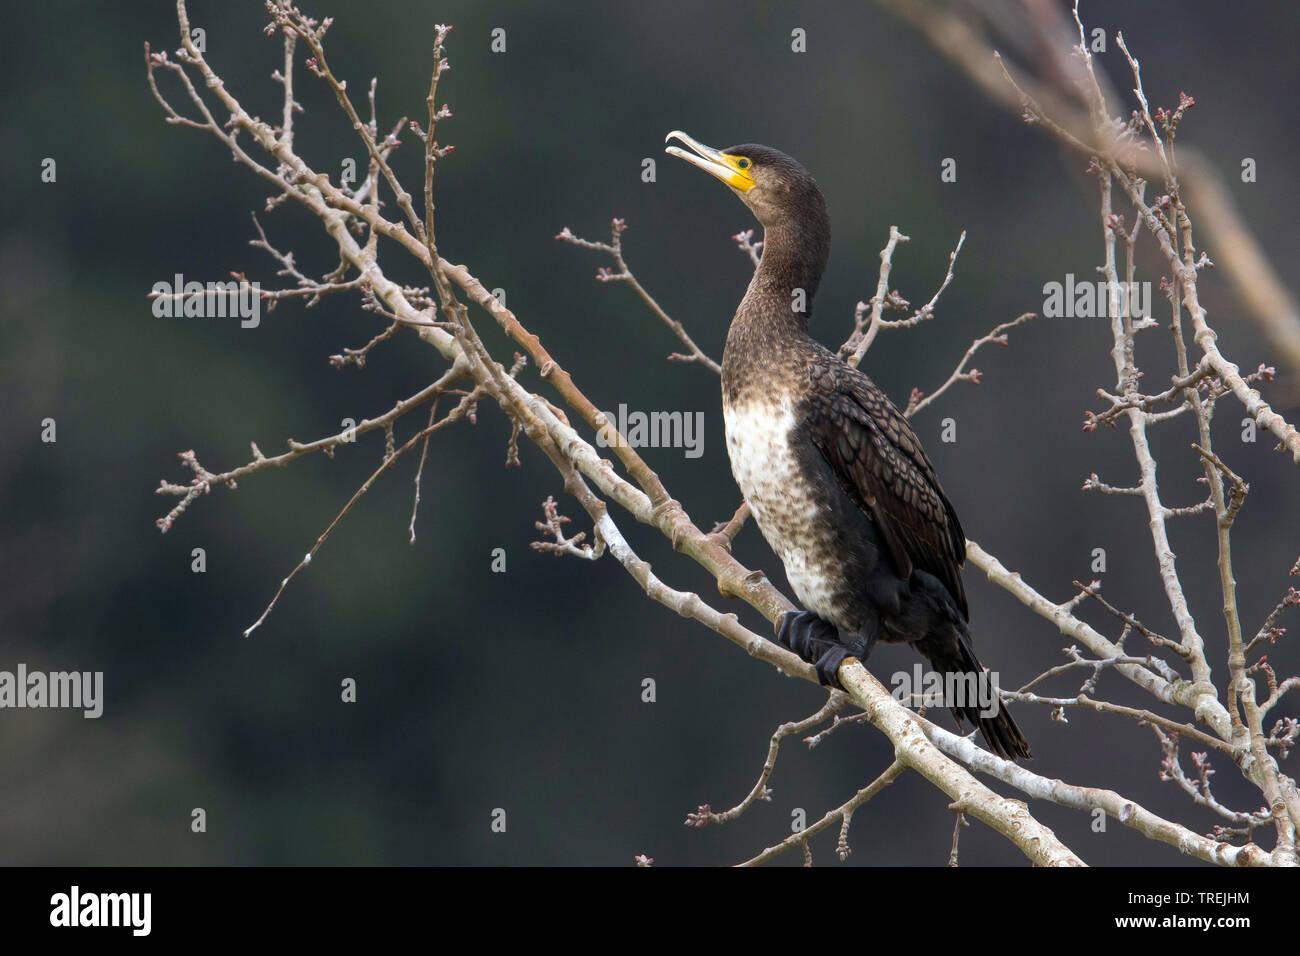 Chinesischer Kormoran (Phalacrocorax carbo sinensis, Phalacrocorax sinensis), sitzt auf einem Baum, Italien | Chinese great cormorant (Phalacrocorax c - Stock Image